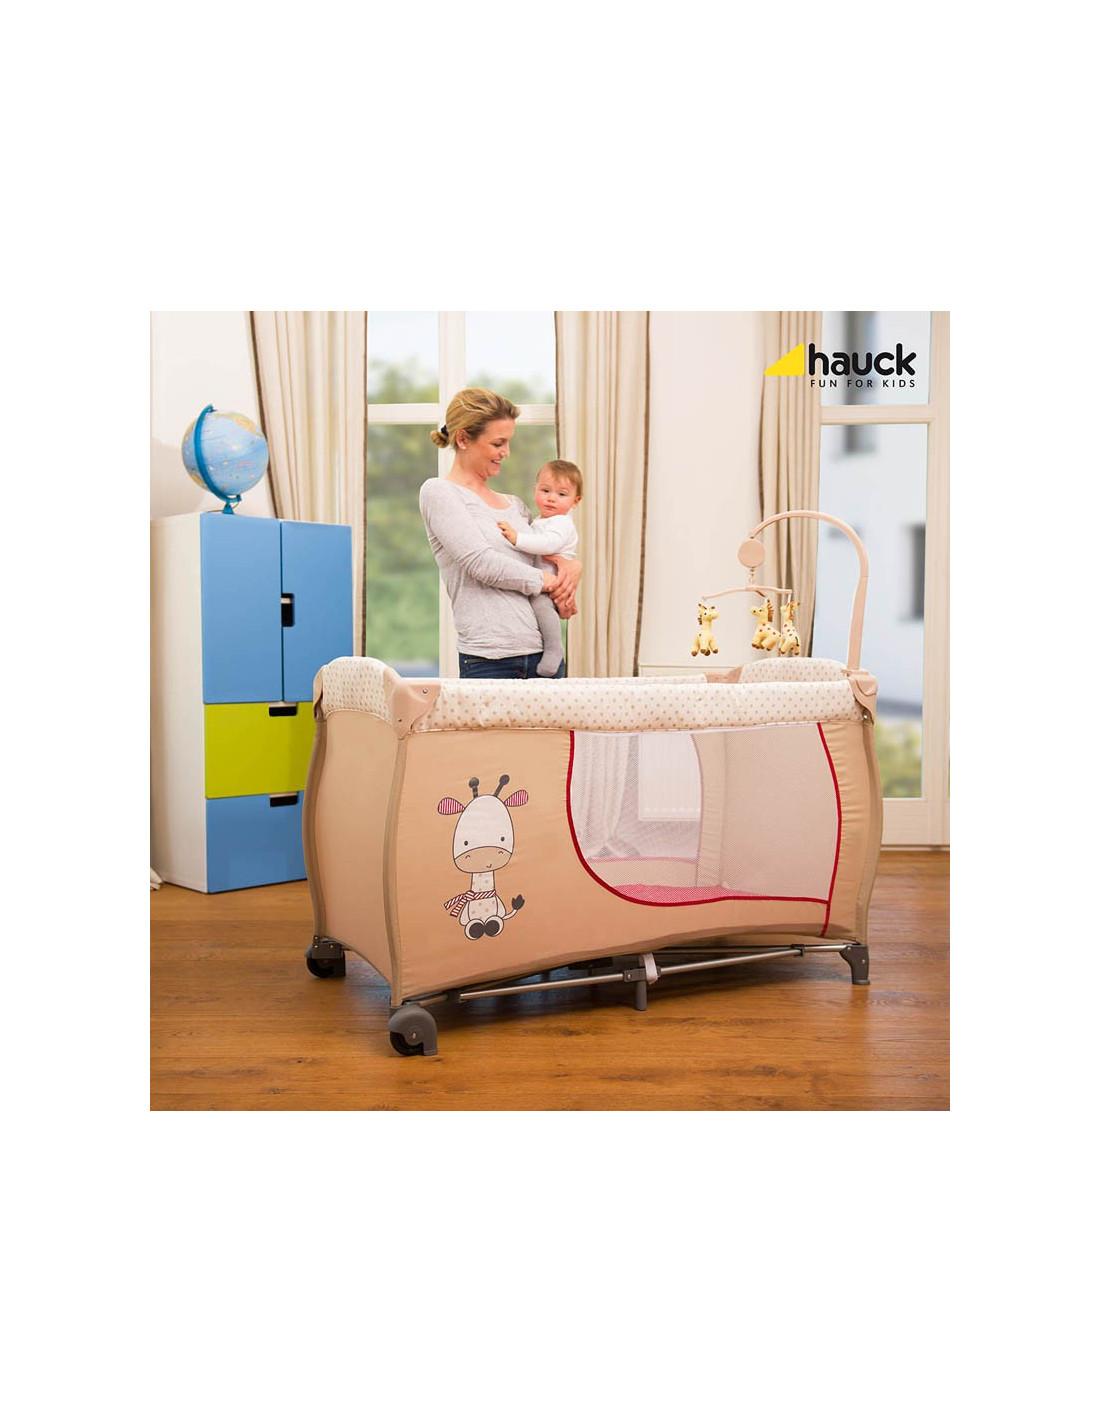 cuna de viaje babycenter giraffe de hauck. Black Bedroom Furniture Sets. Home Design Ideas